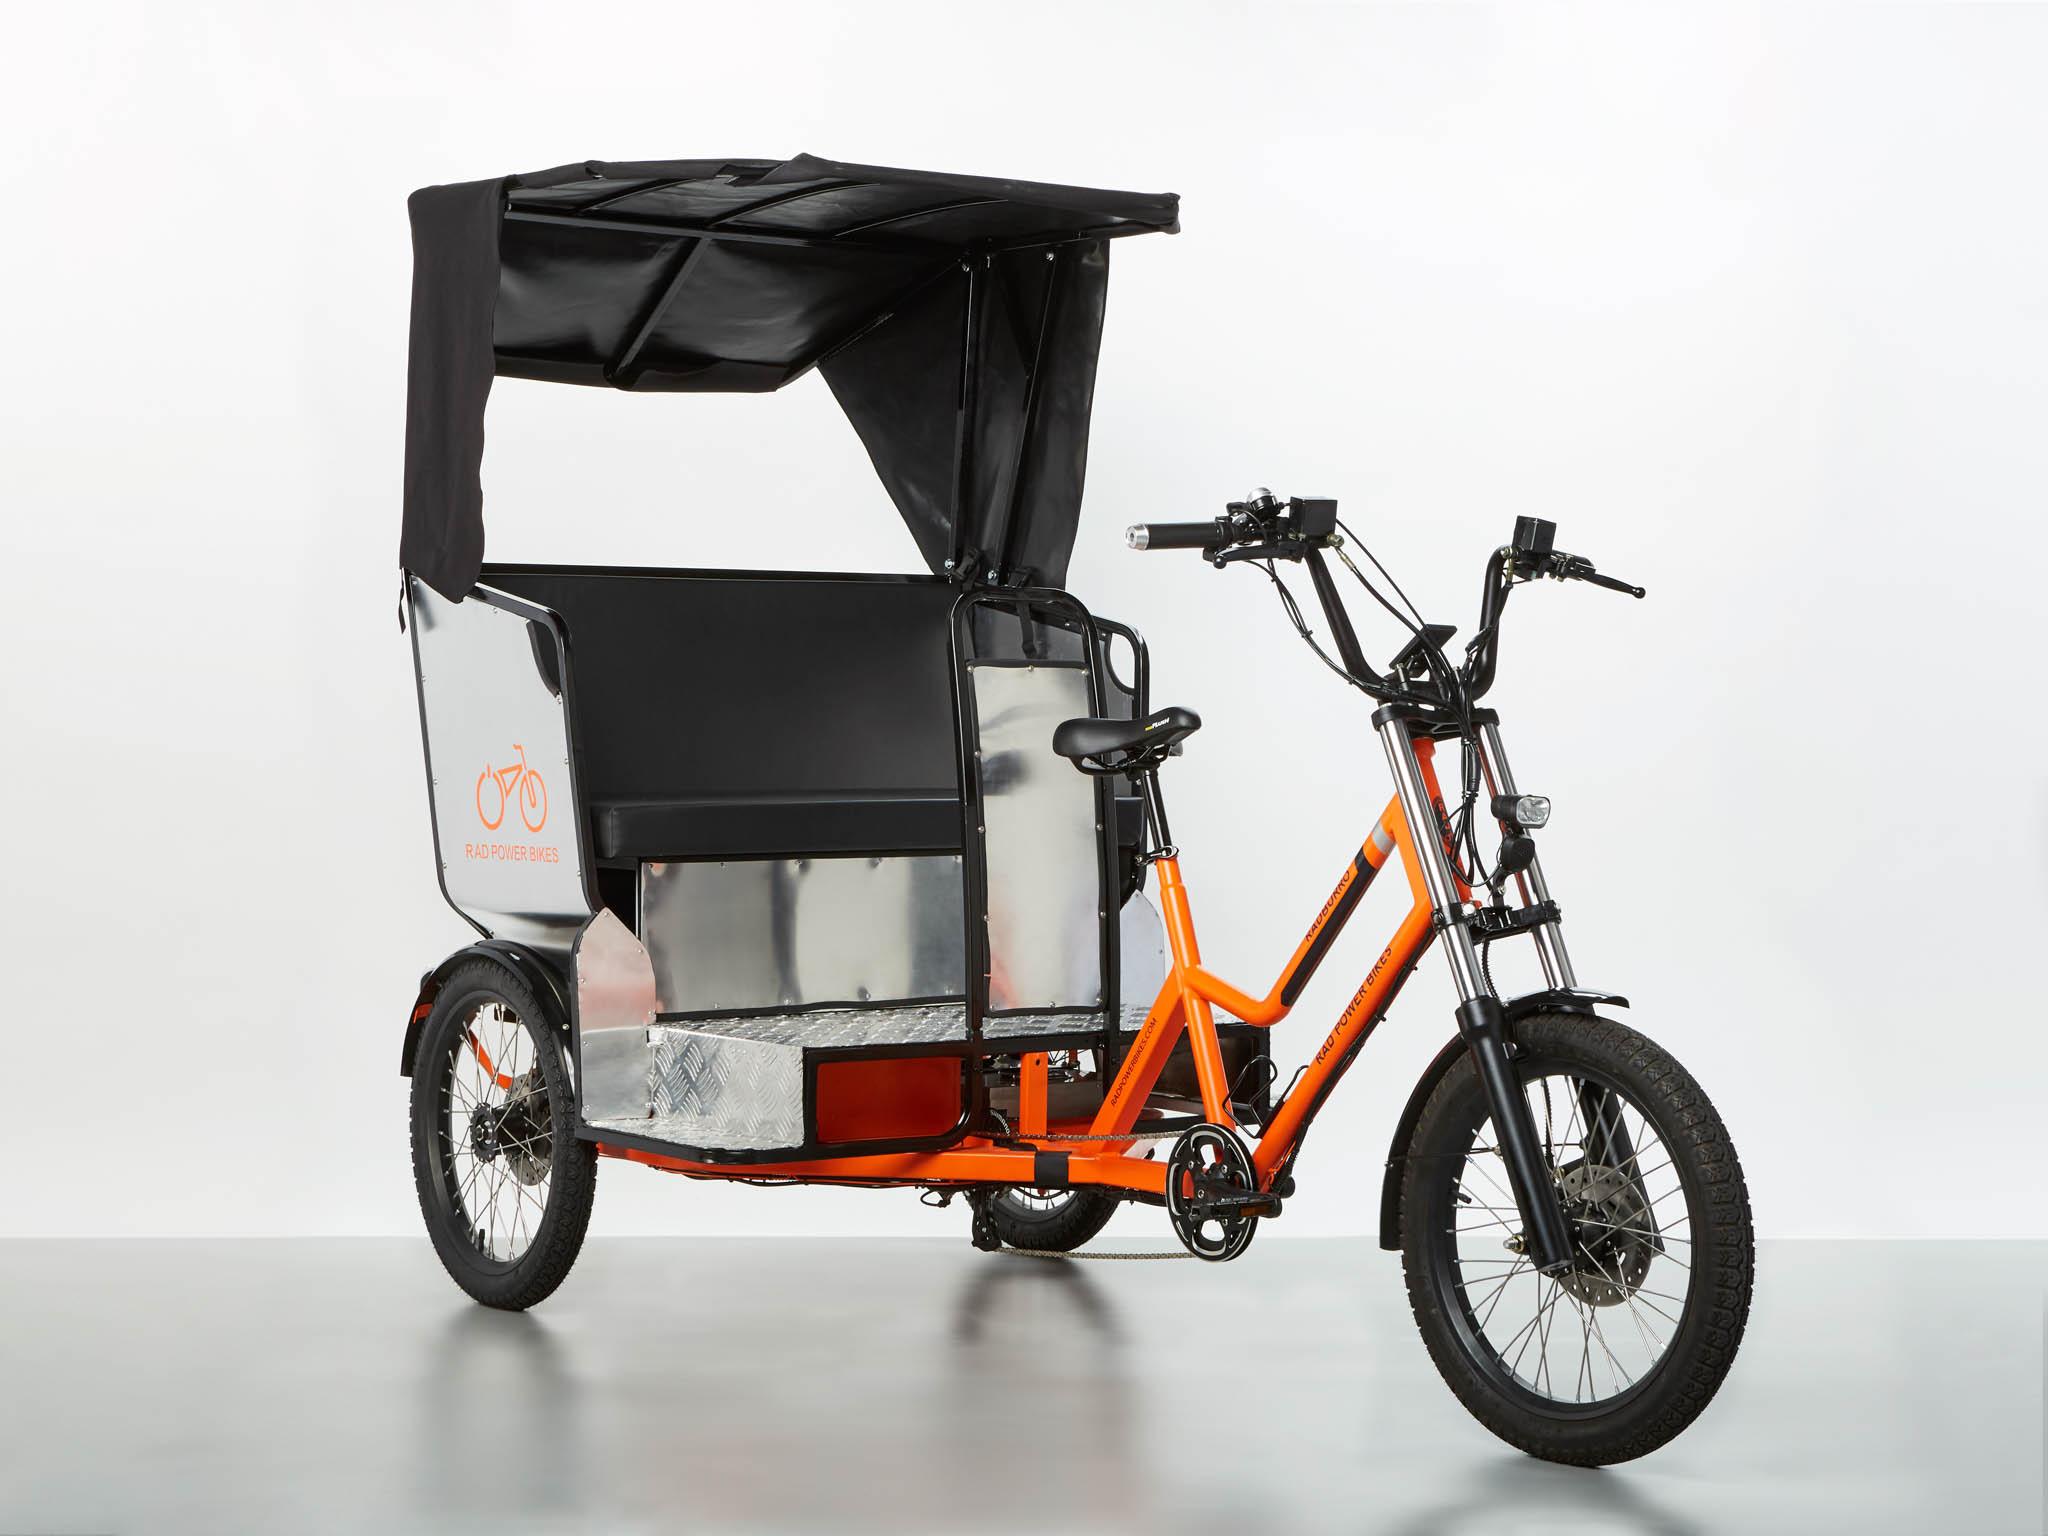 Heavy Duty Electric Cargo Bikes Trikes Guide Videos Electric Bike Report Electric Bike Ebikes Electric Bicycles E Bike Reviews